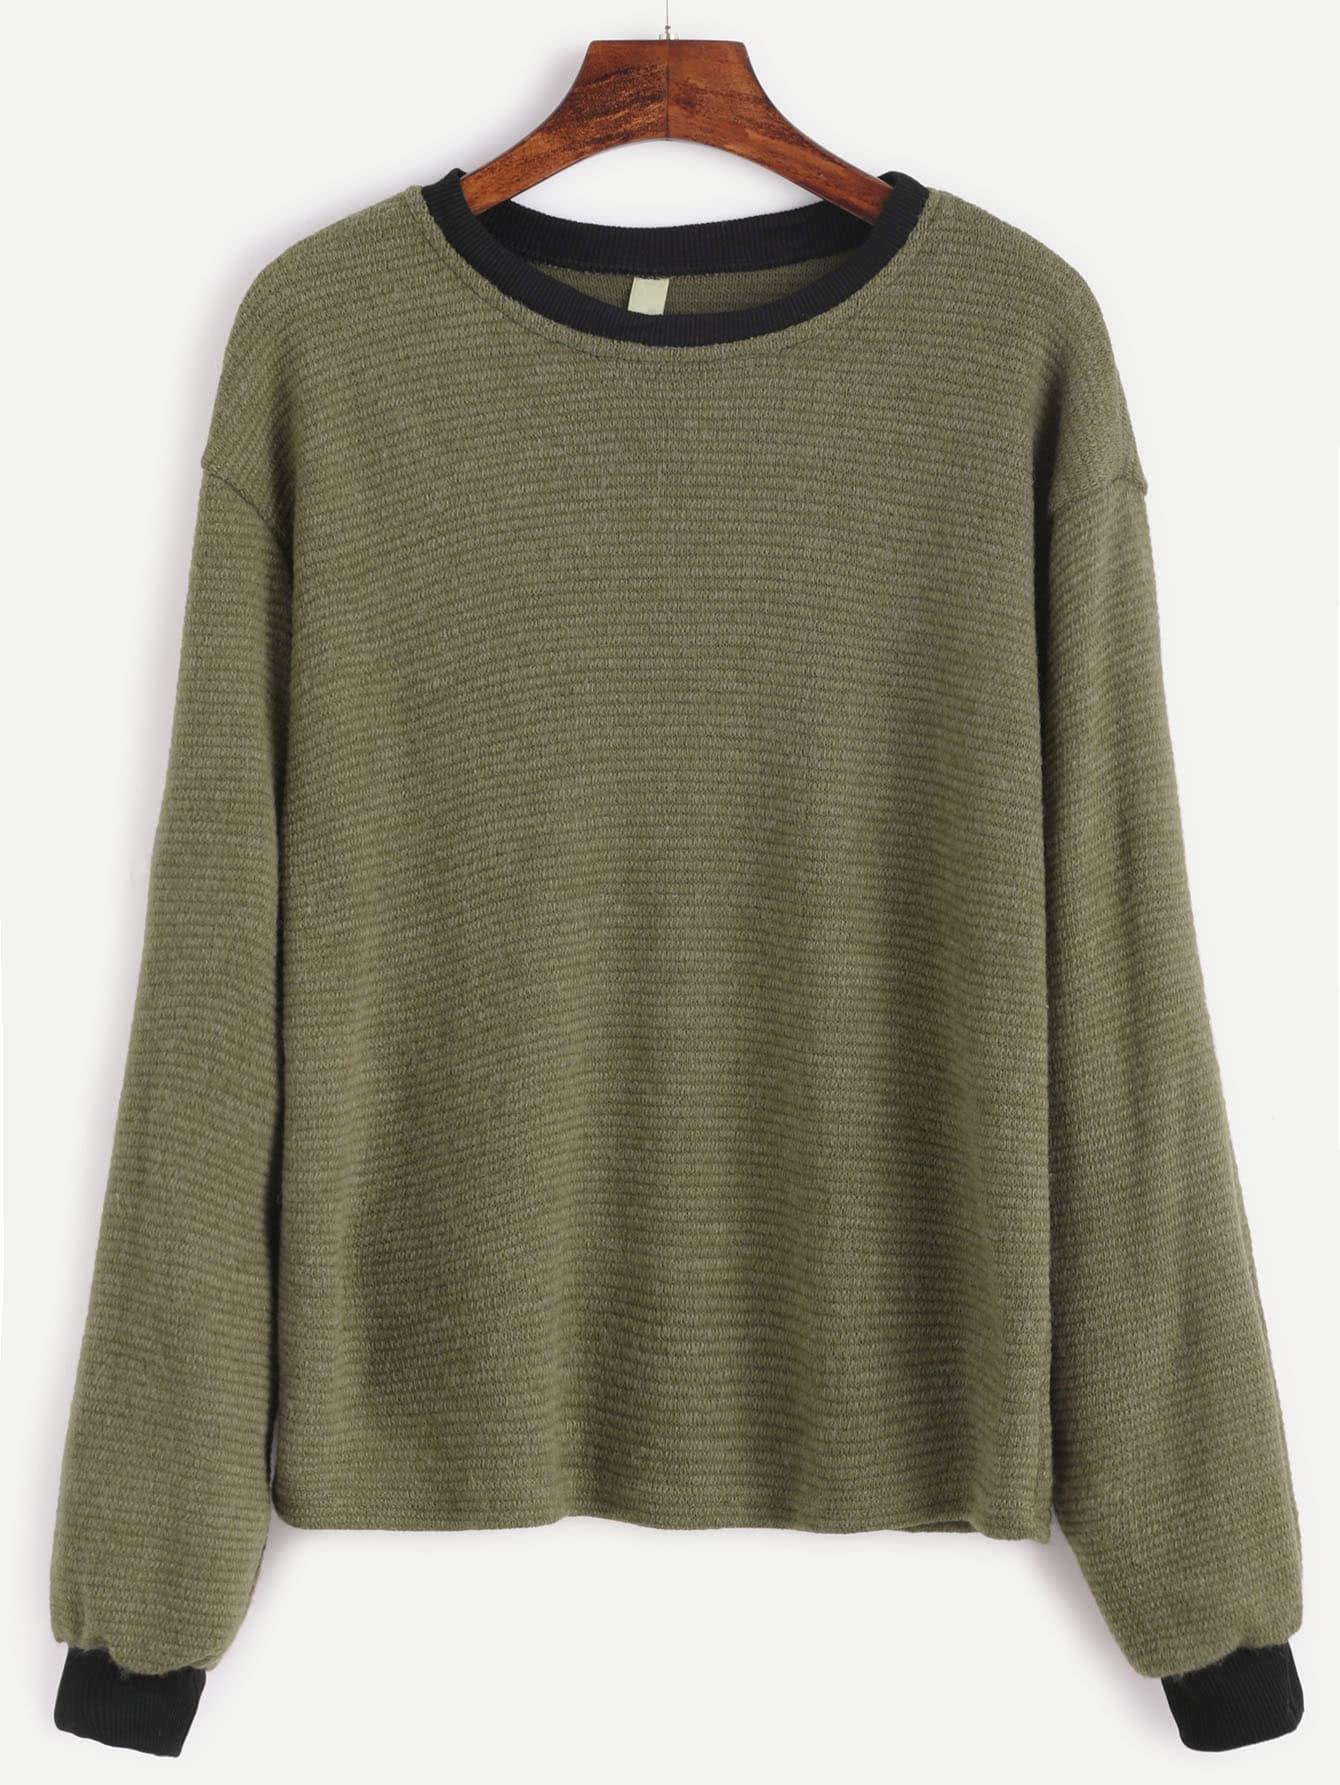 Contrast Trim Drop Shoulder Ribbed Sweater sweater161006101